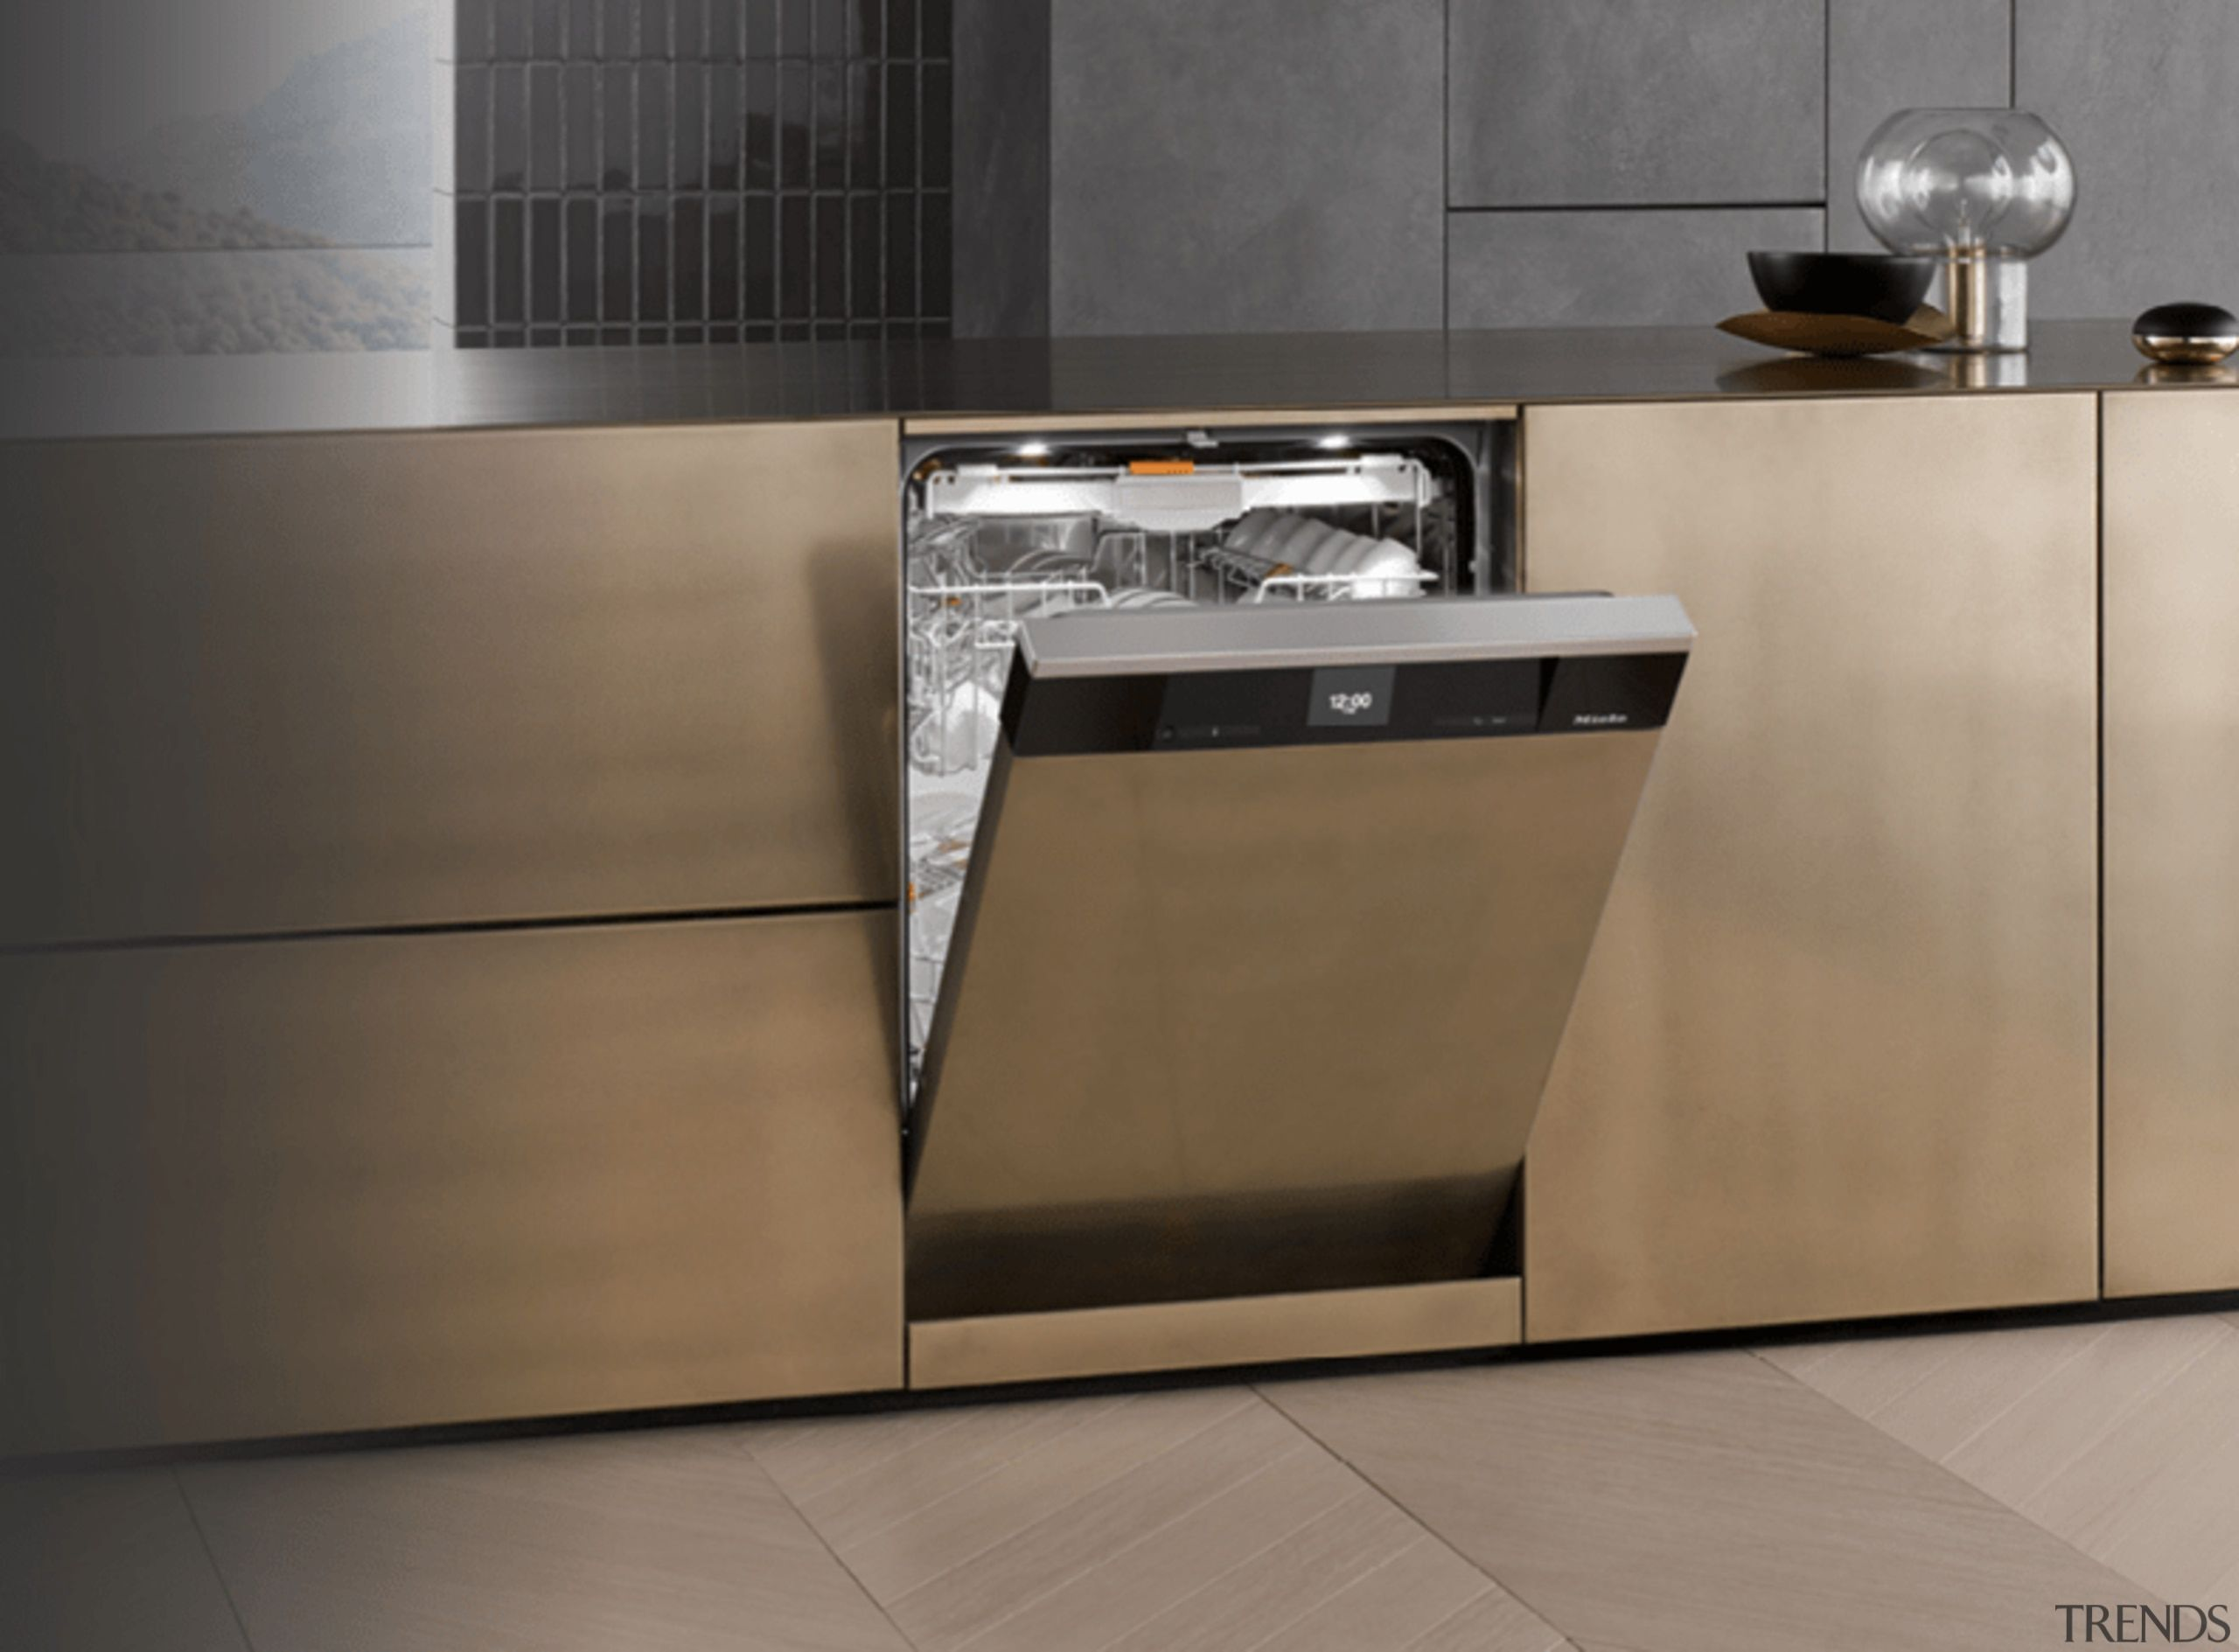 Miele Semi Integrated Dishwasher Ideas Want Miele Fully Integrated Integrated Dishwasher Kitchen Modular Kitchen Dishwasher